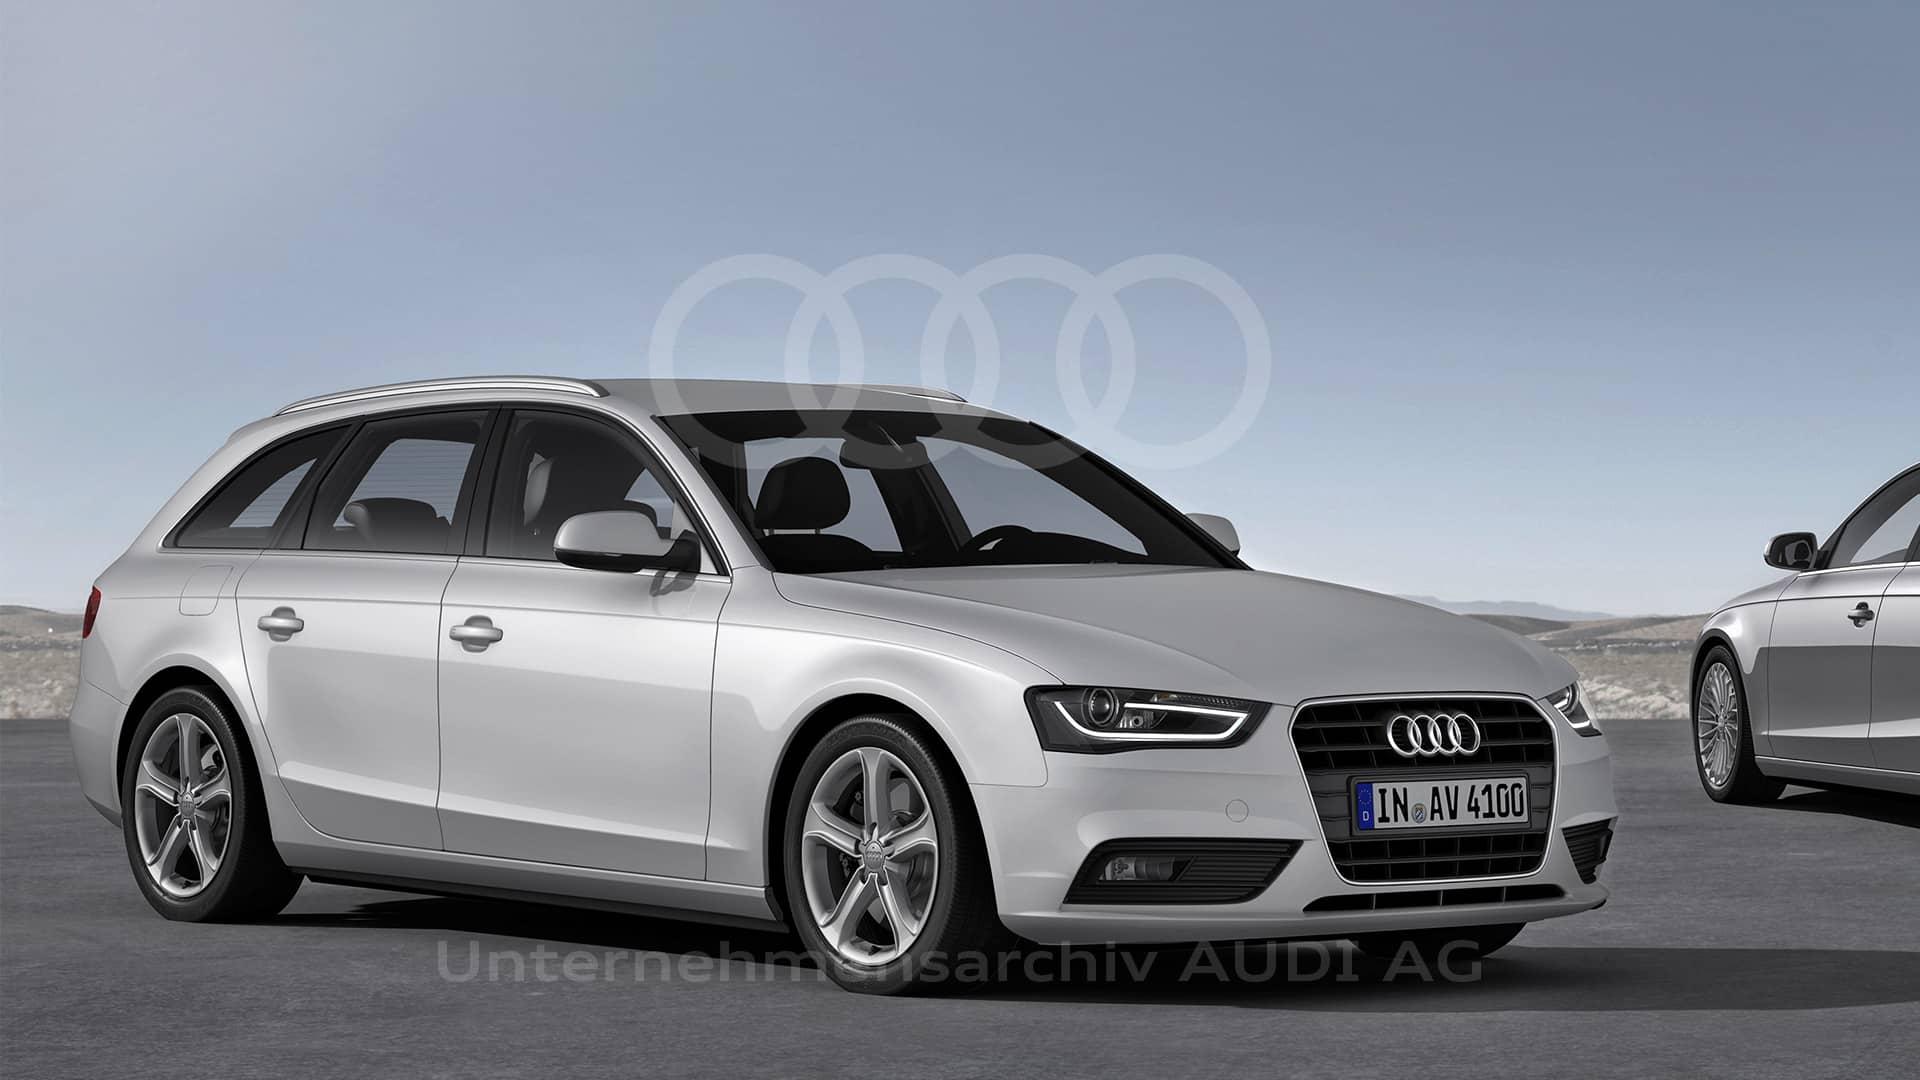 A4 Avant Audi A4 B8 Audi A4 Audi Deutschland